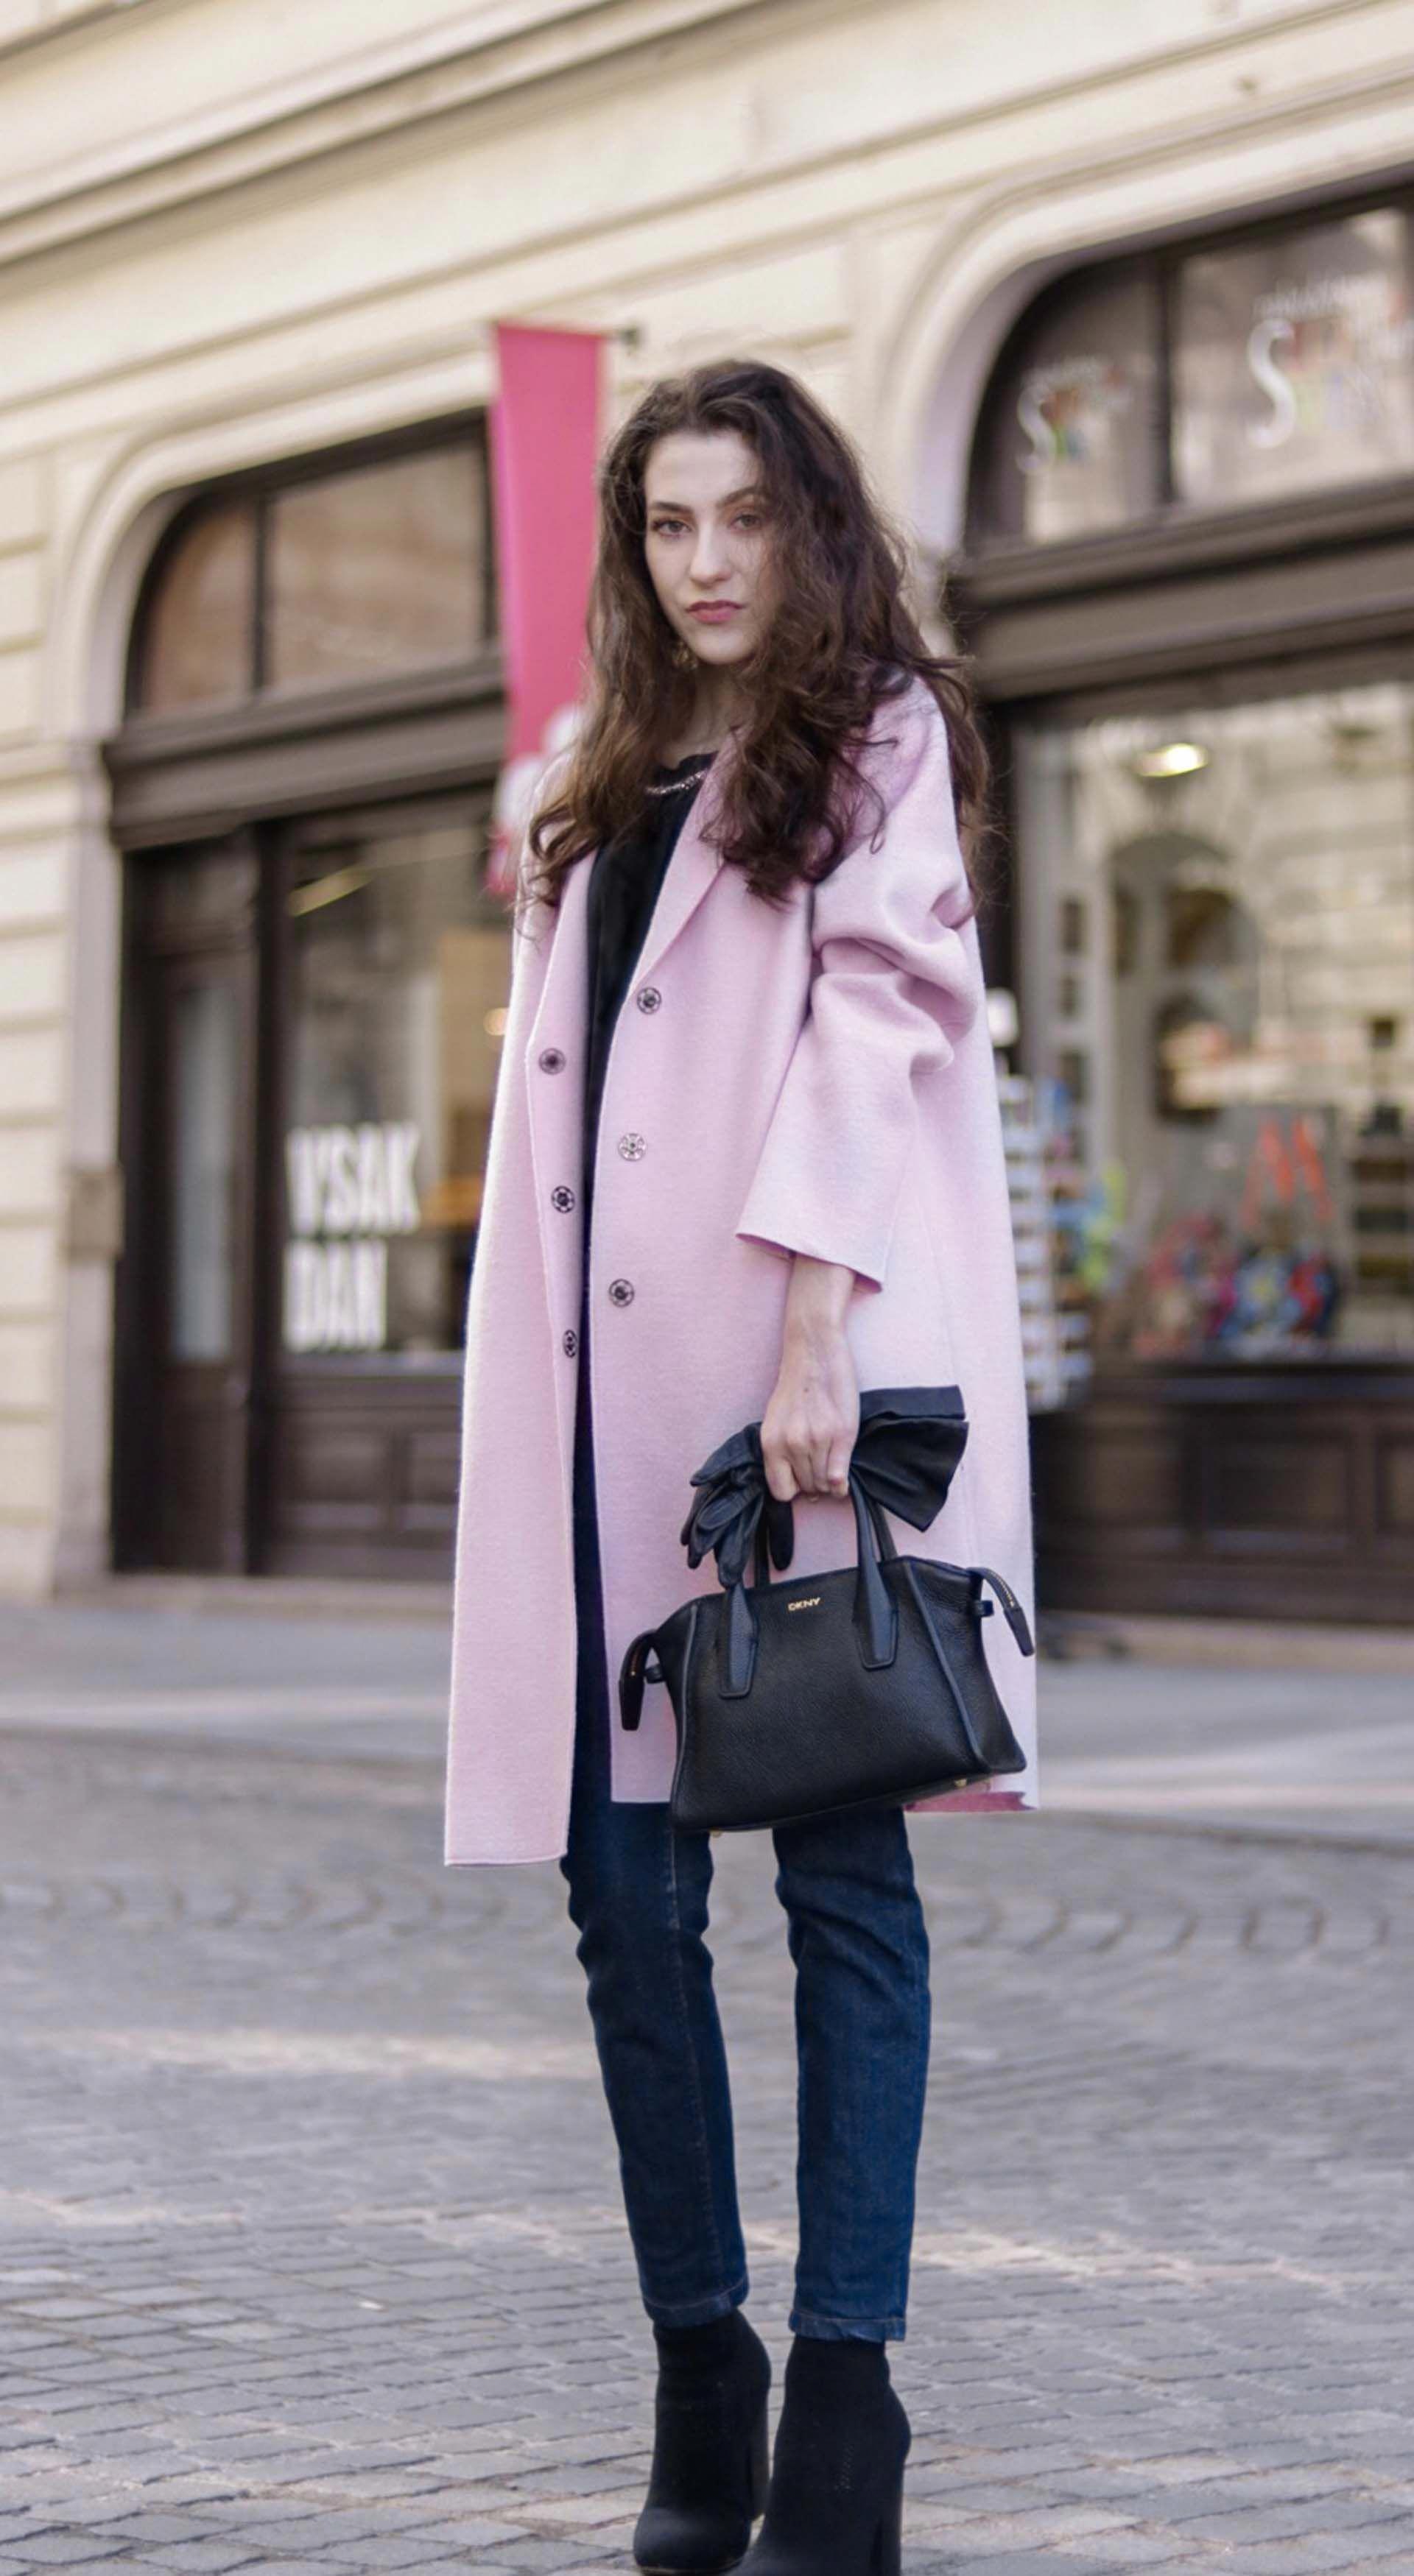 3de8062e0e3 Beautiful Slovenian Fashion Blogger Veronika Lipar of Brunette from Wall  dressed in Harris Wharf London pink oversized coat